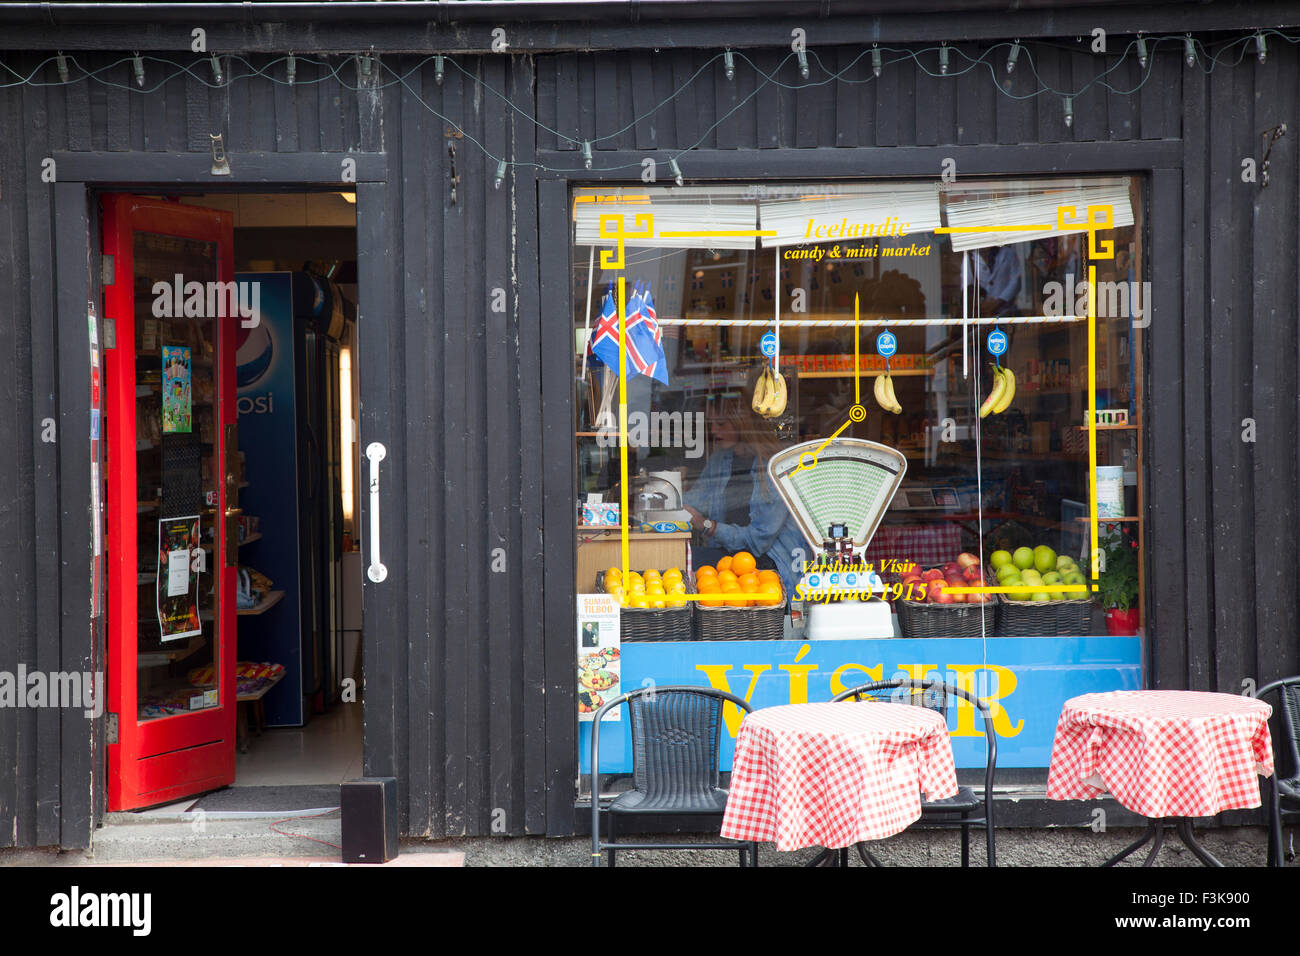 Un magasin de façade, Laugavegur, Reykjavik, Islande. Photo Stock